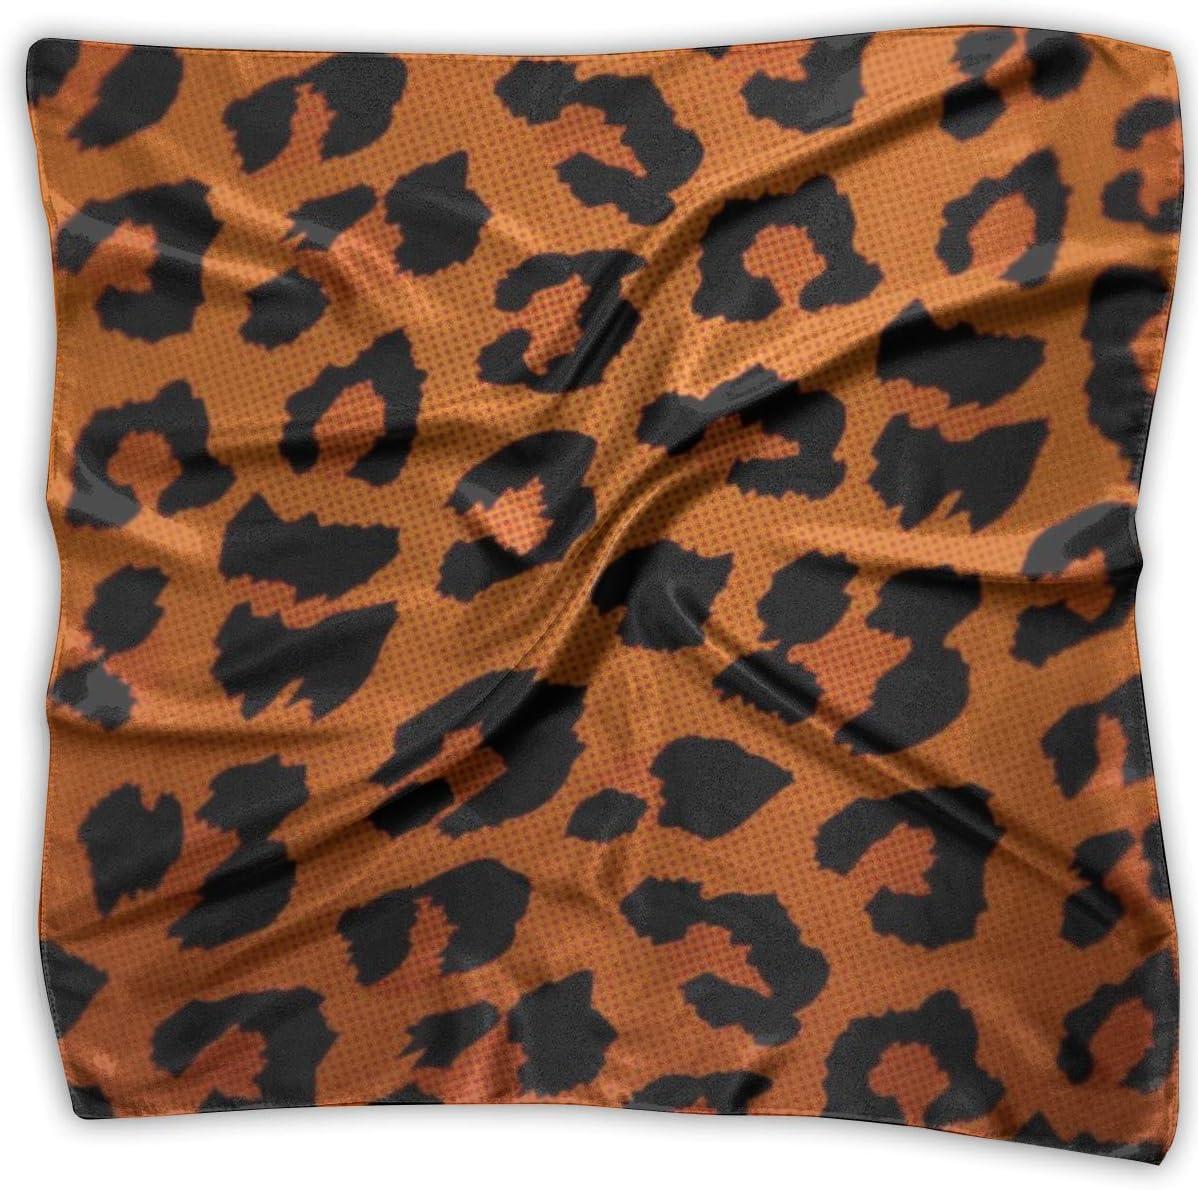 YANGZXC Leopard Skin Animal Print Handkerchief Polyester Pocket Square Mulipurpose Silk Bandanas Delicate Printing